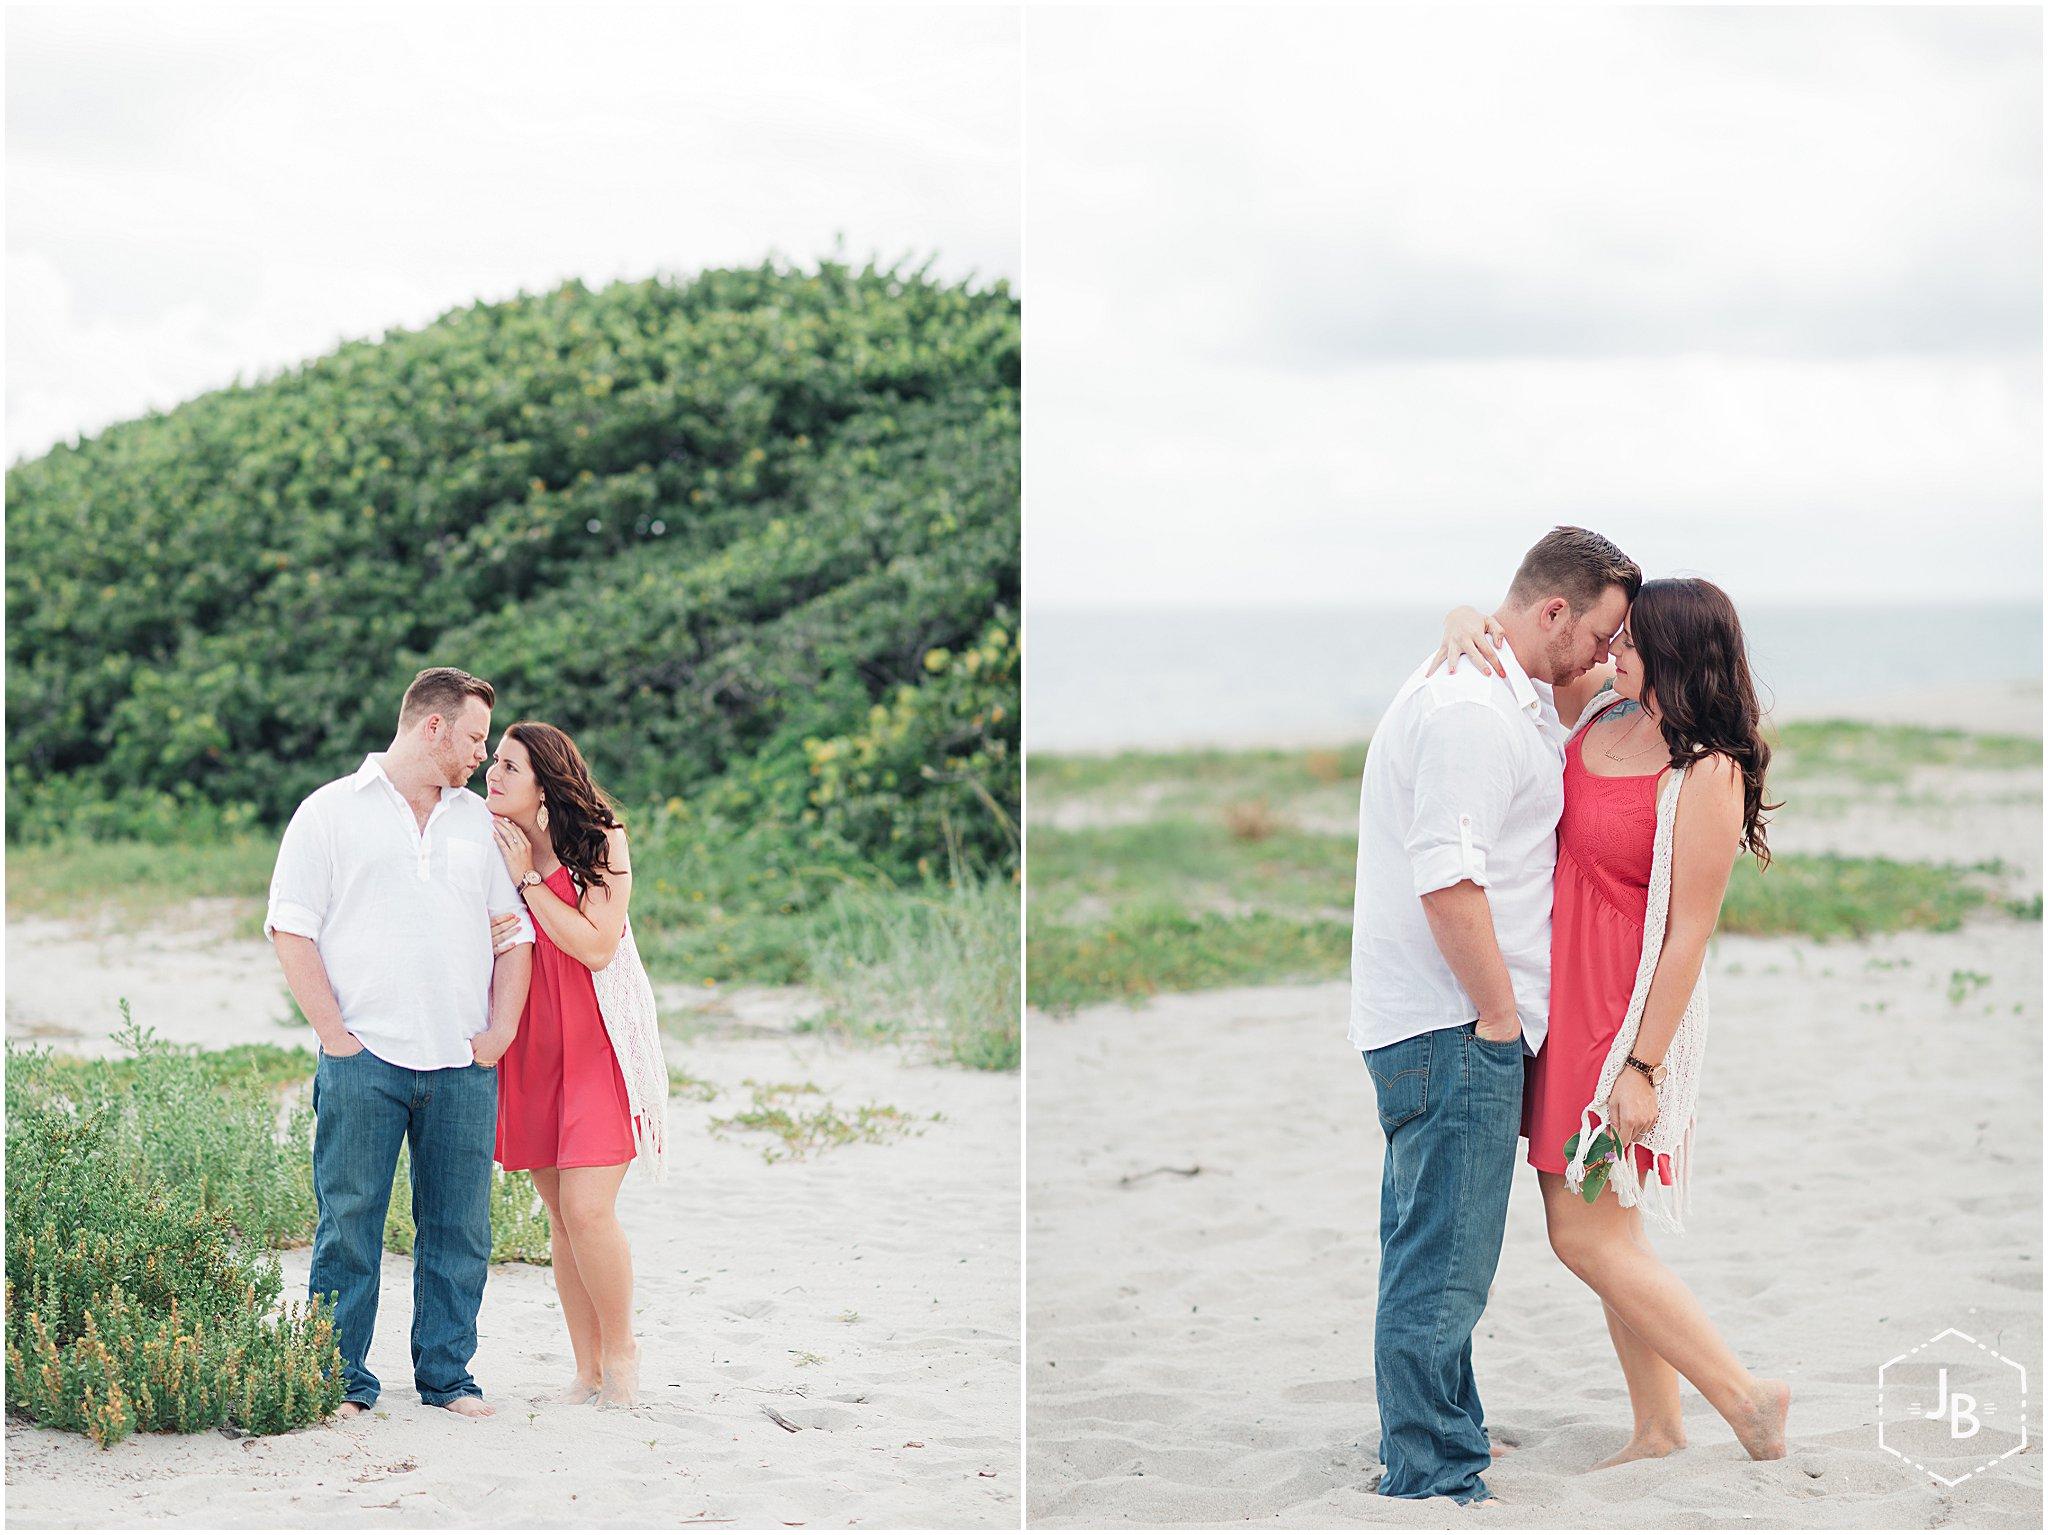 WeddingandEngagementFloridaPhotographer_0016.jpg